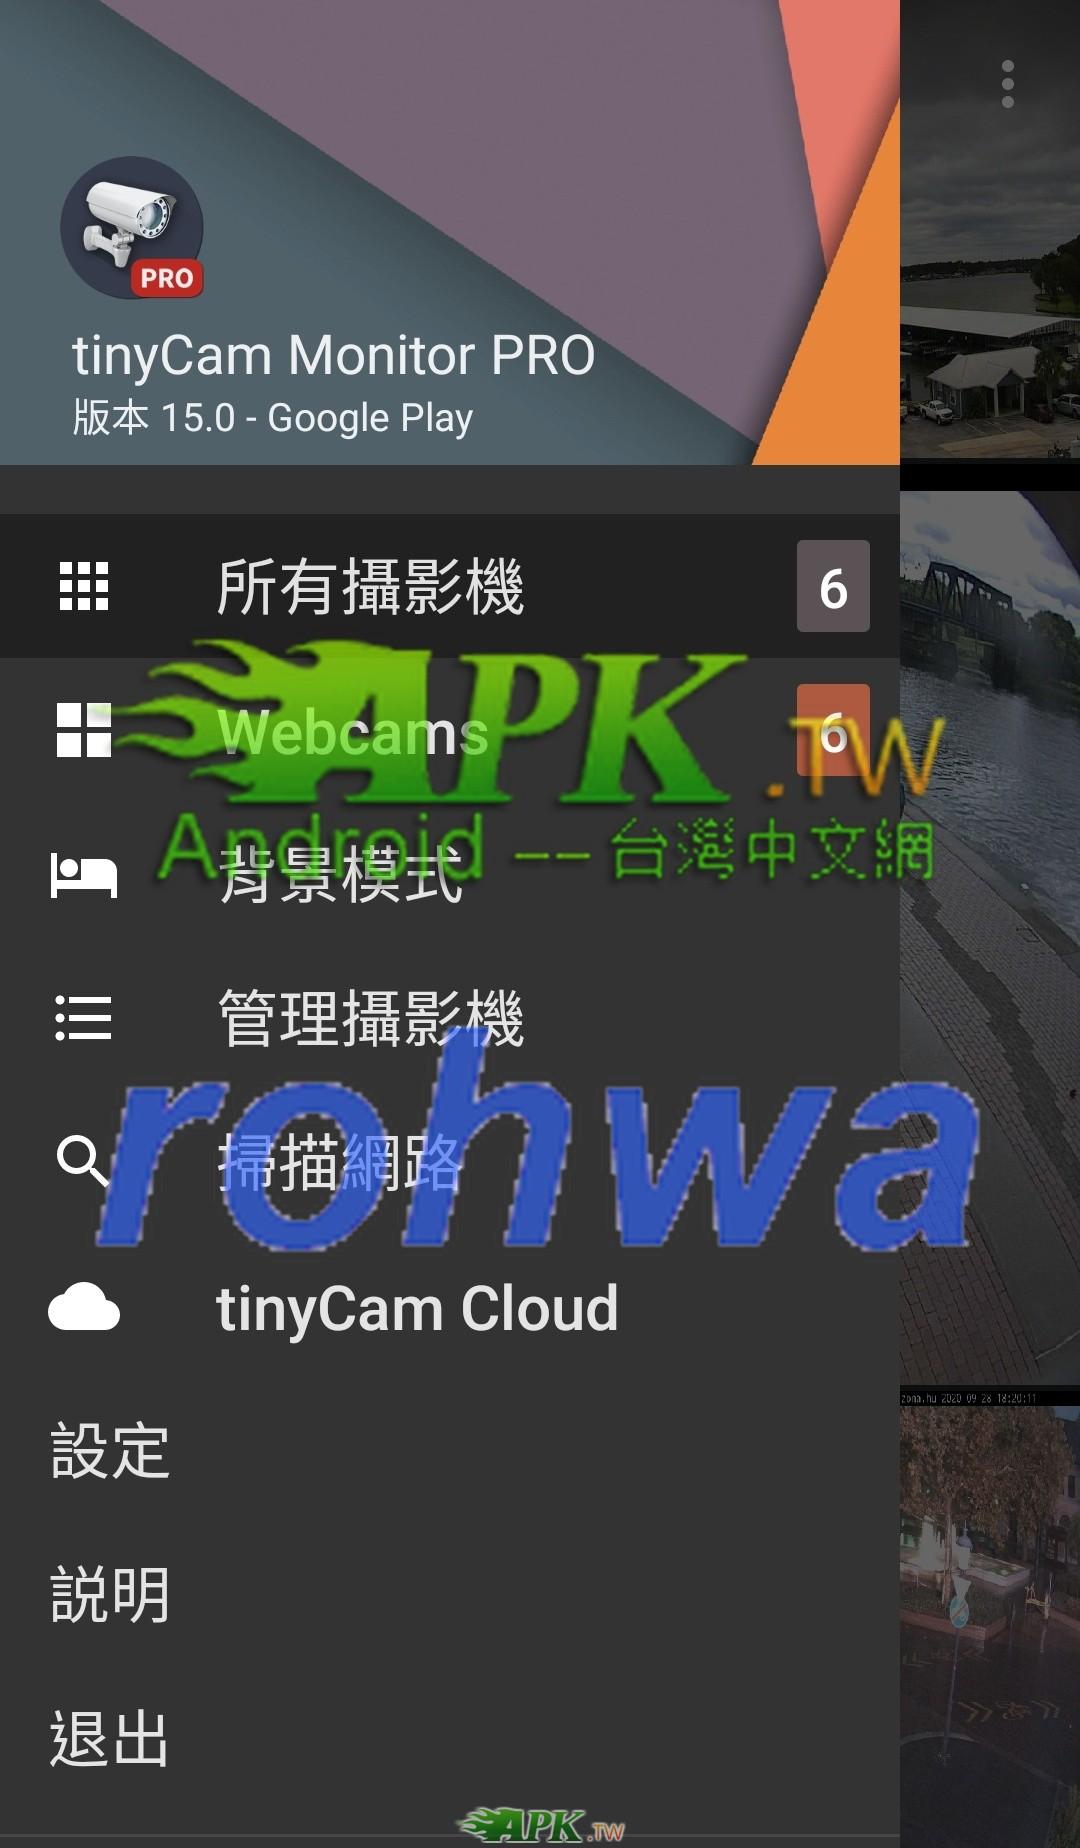 tinyCam__1__.jpg